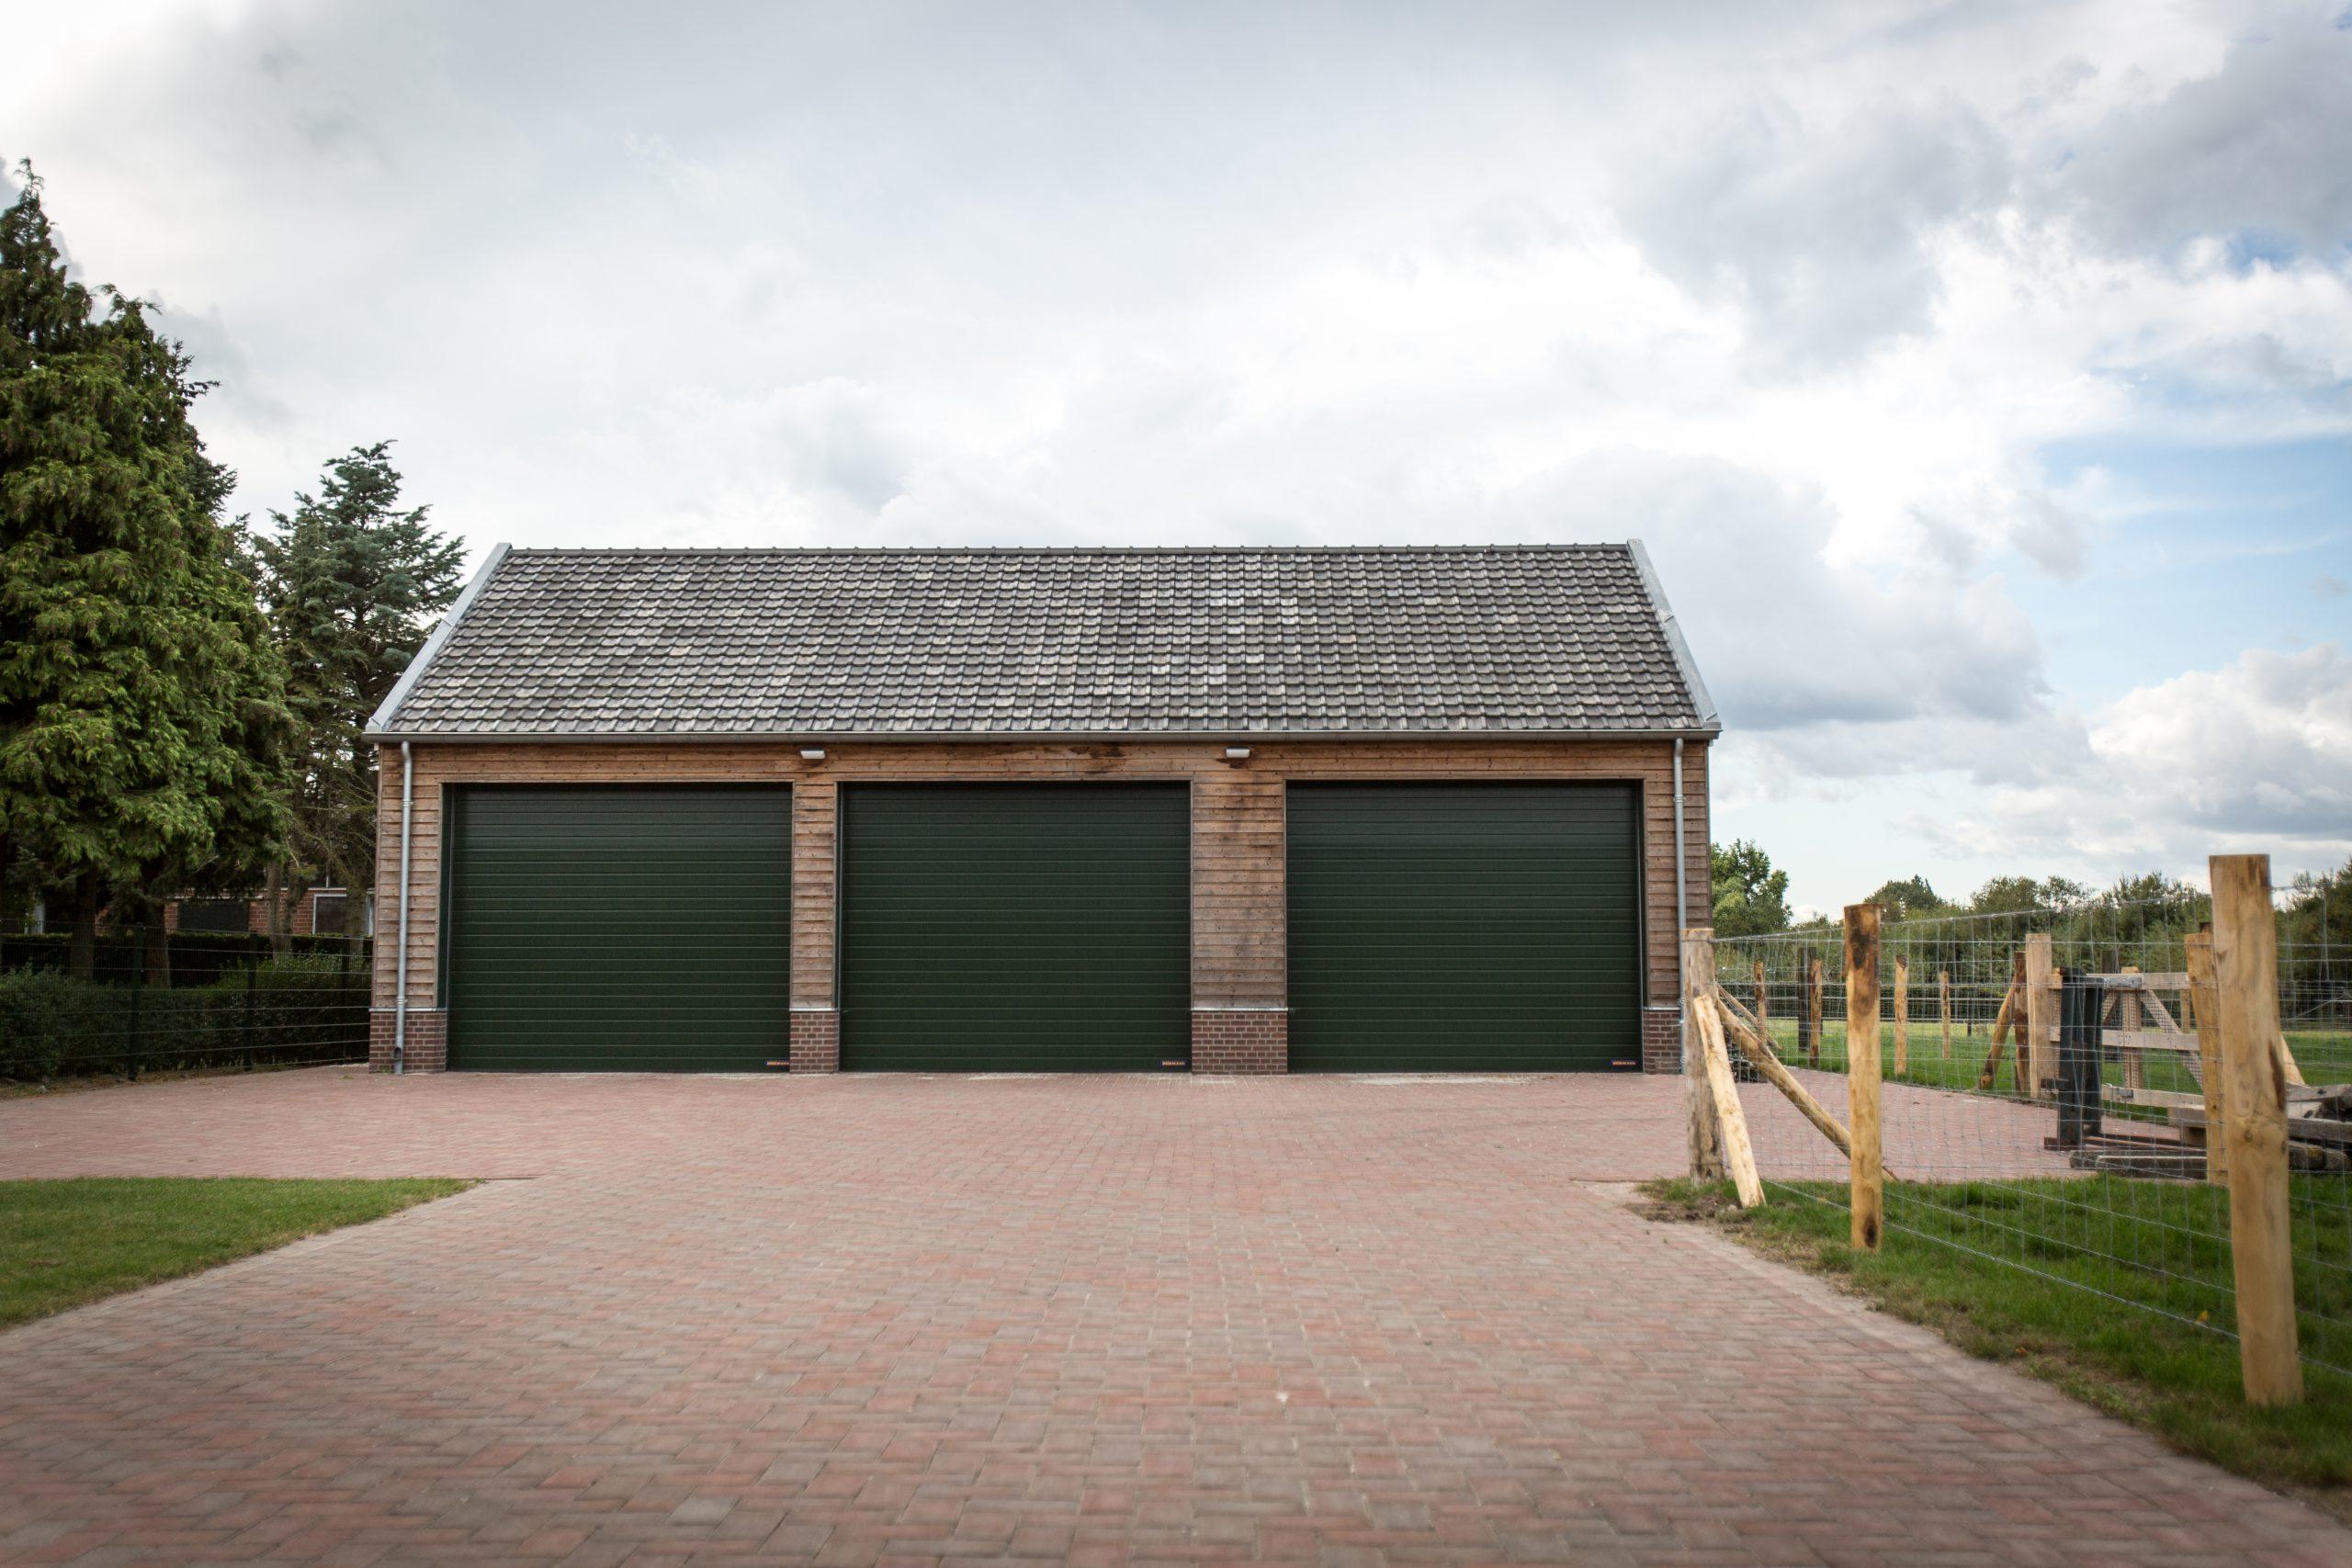 Garage met houten gevelbekleding